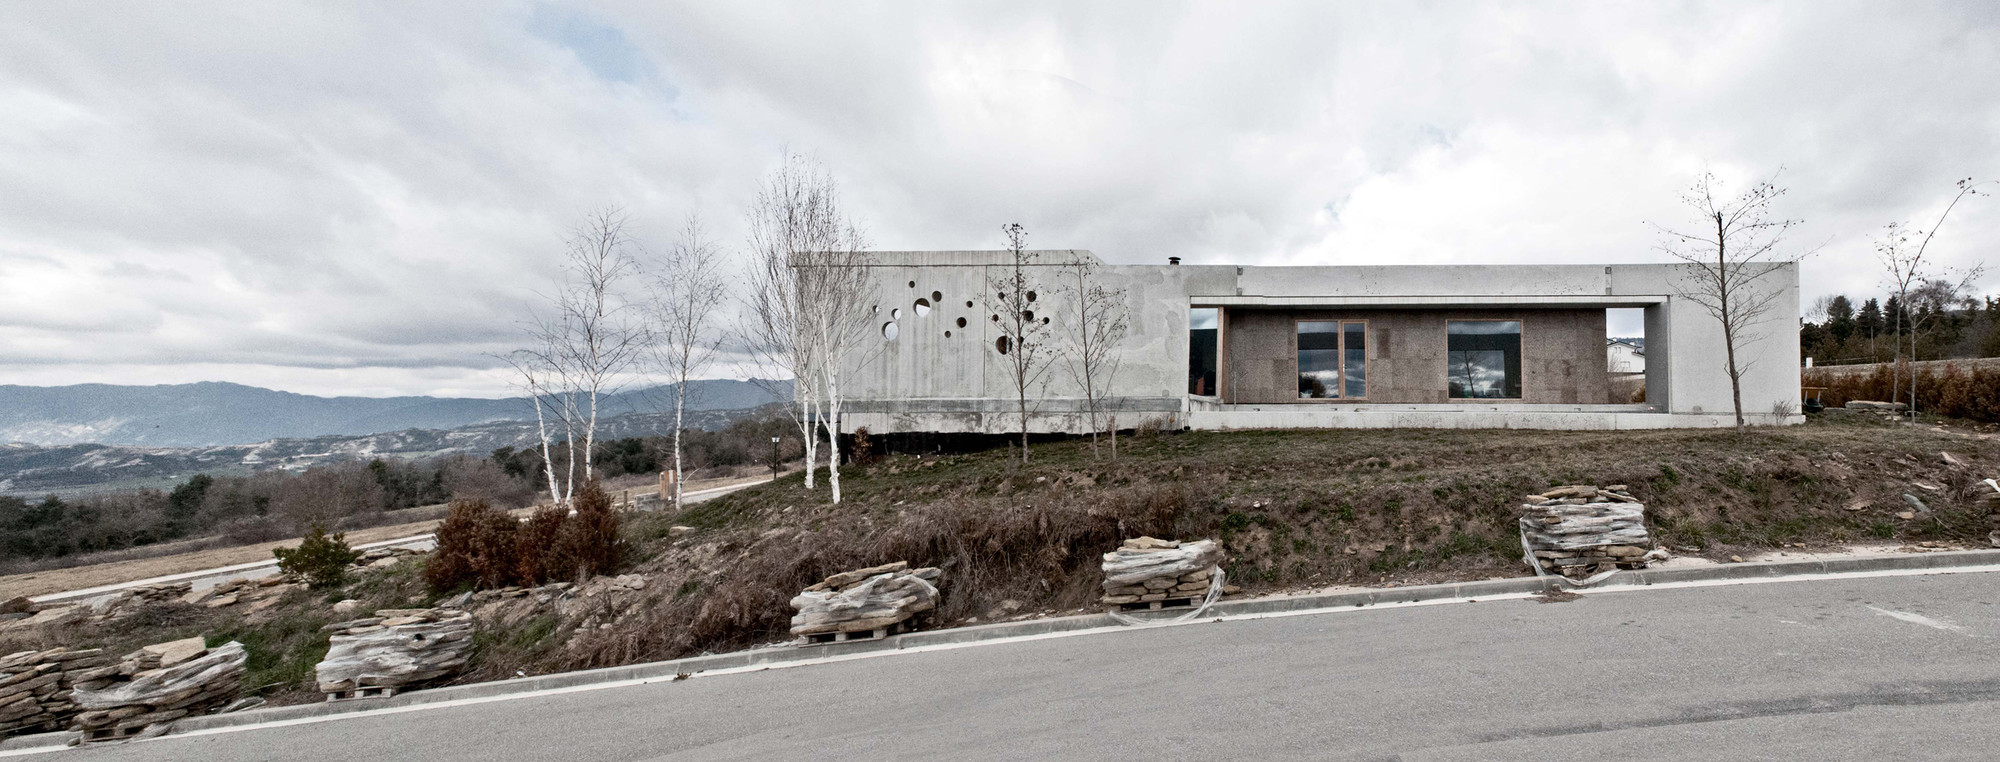 NH House / Marc Rifà-Rovira, © Jaume Prat